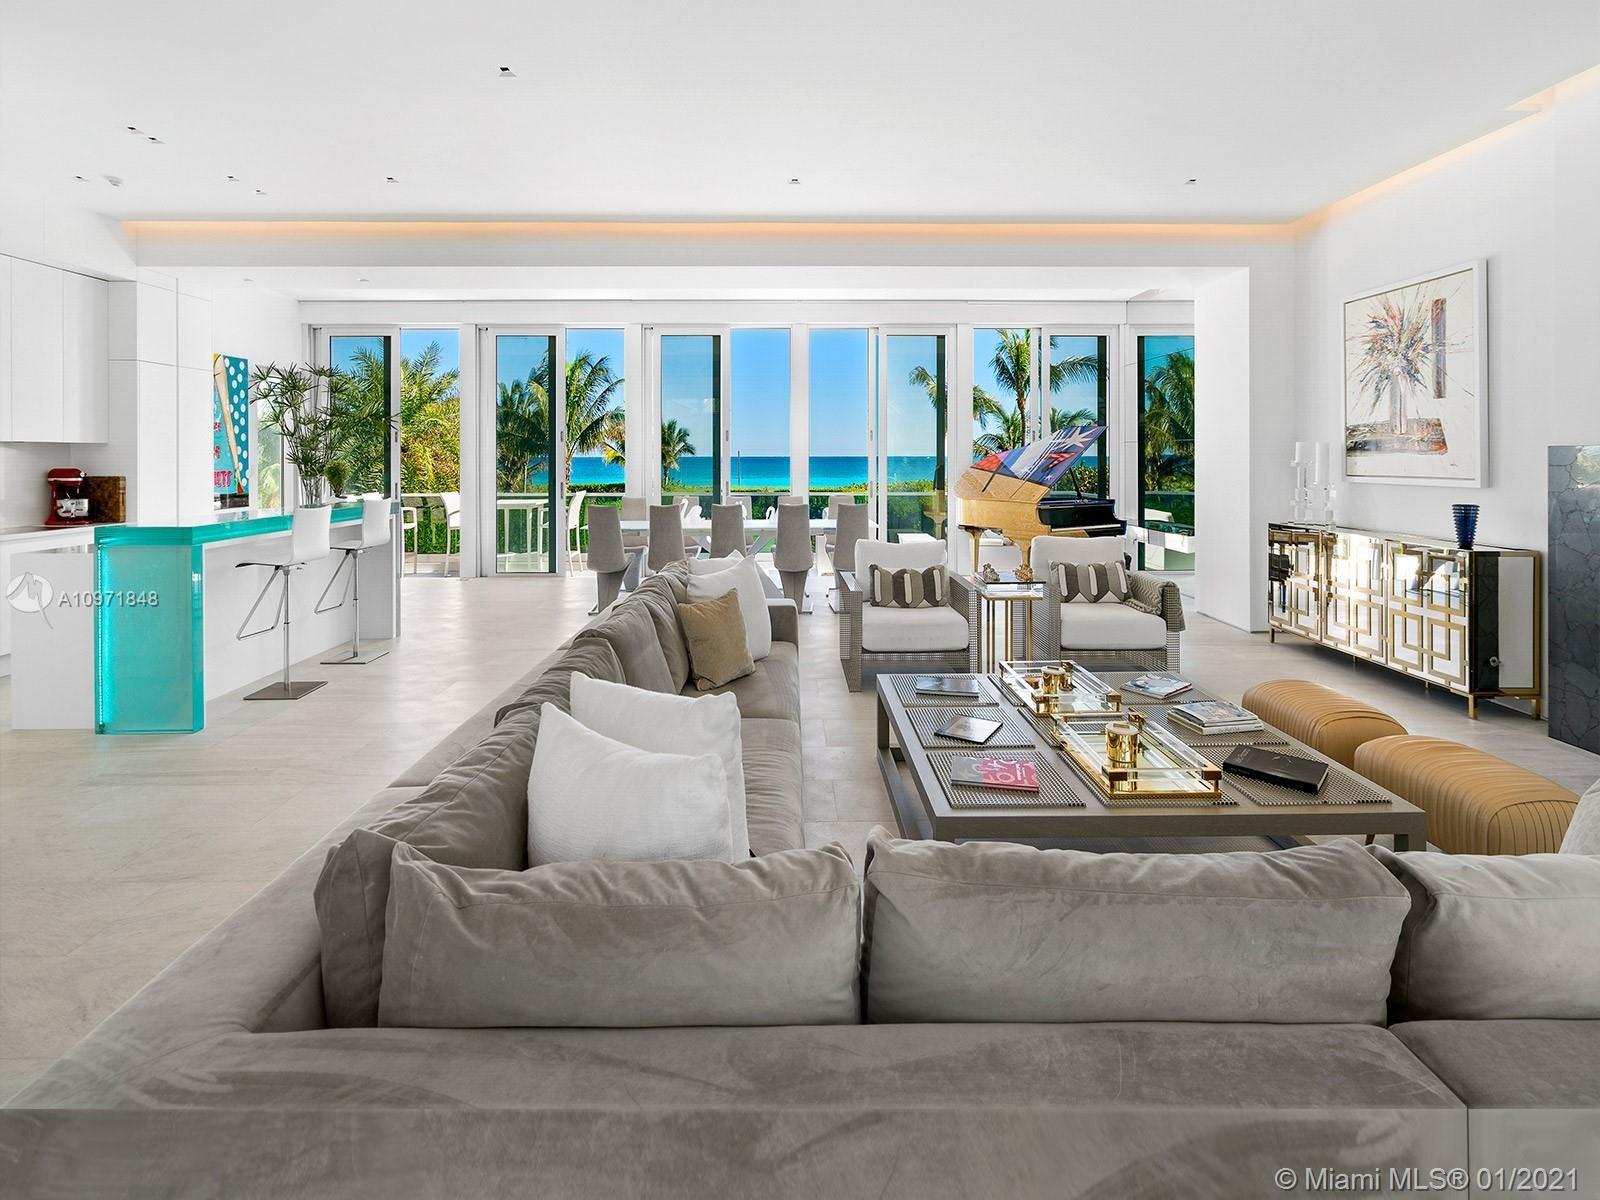 Photo of 7815 Atlantic Way, Miami Beach, FL 33141 (MLS # A10971848)